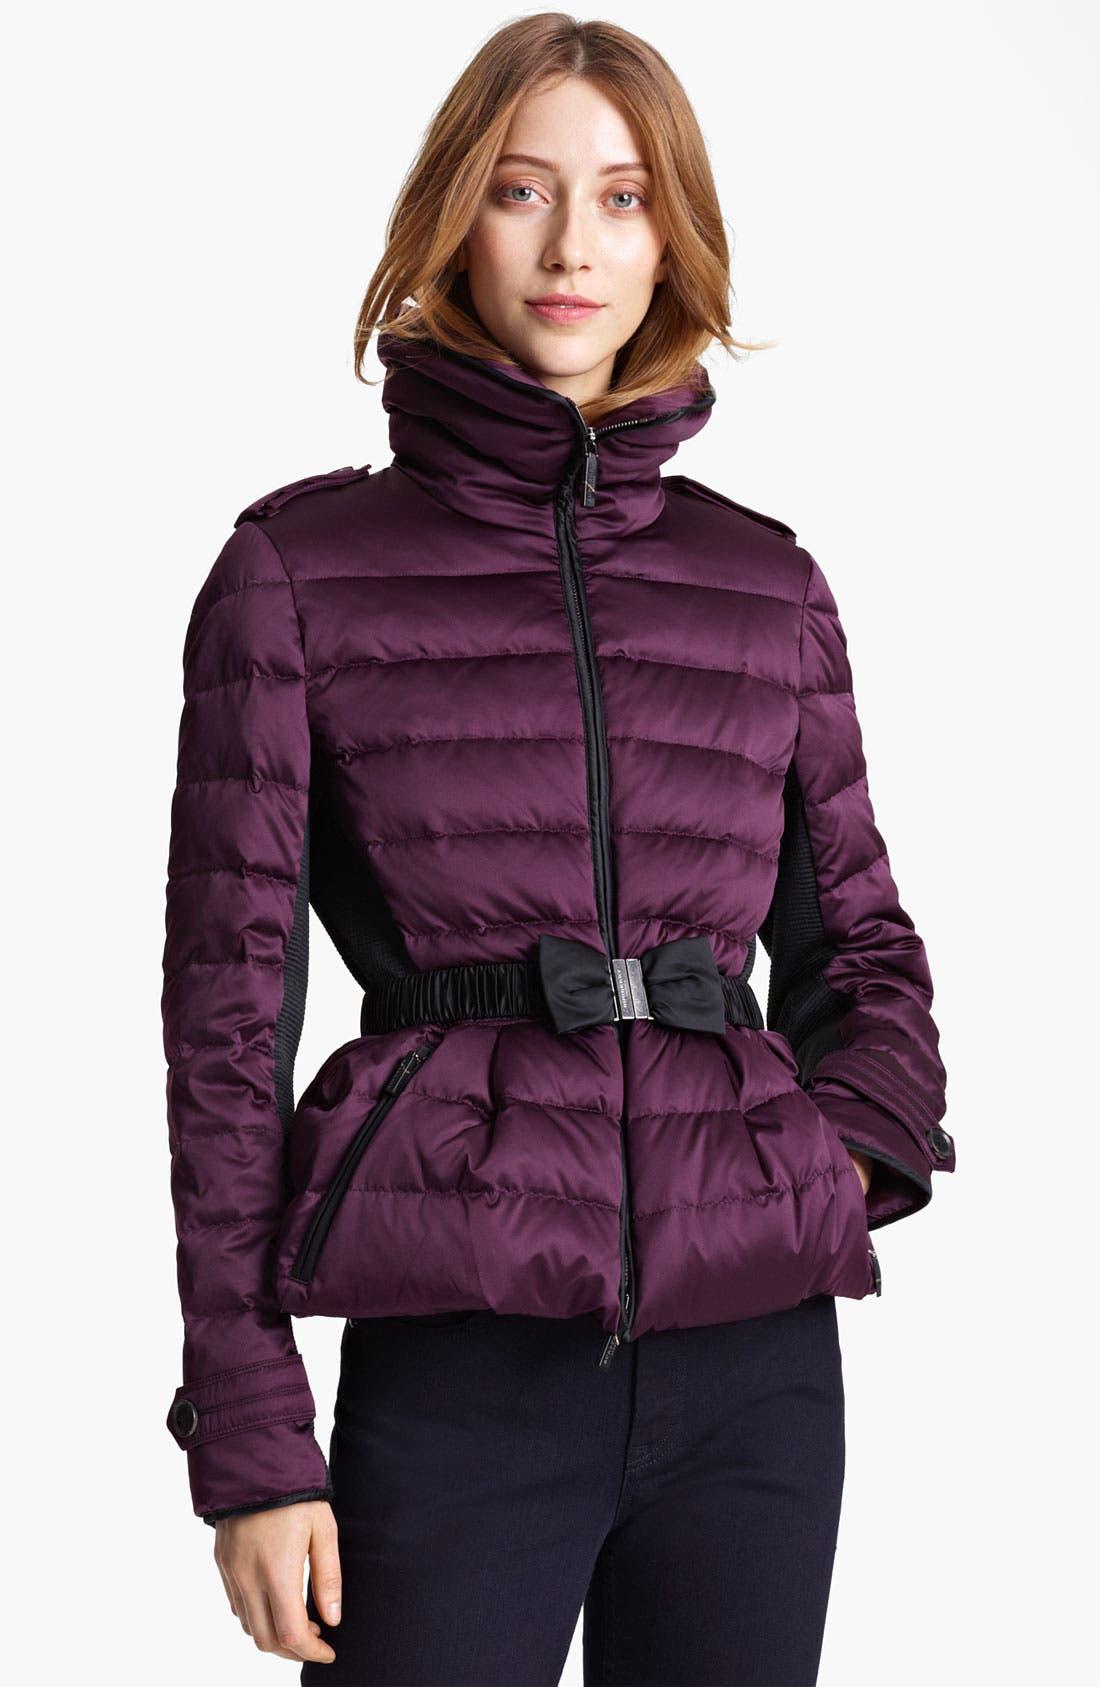 Alternate Image 1 Selected - Burberry London Bow Belt Puffer Jacket